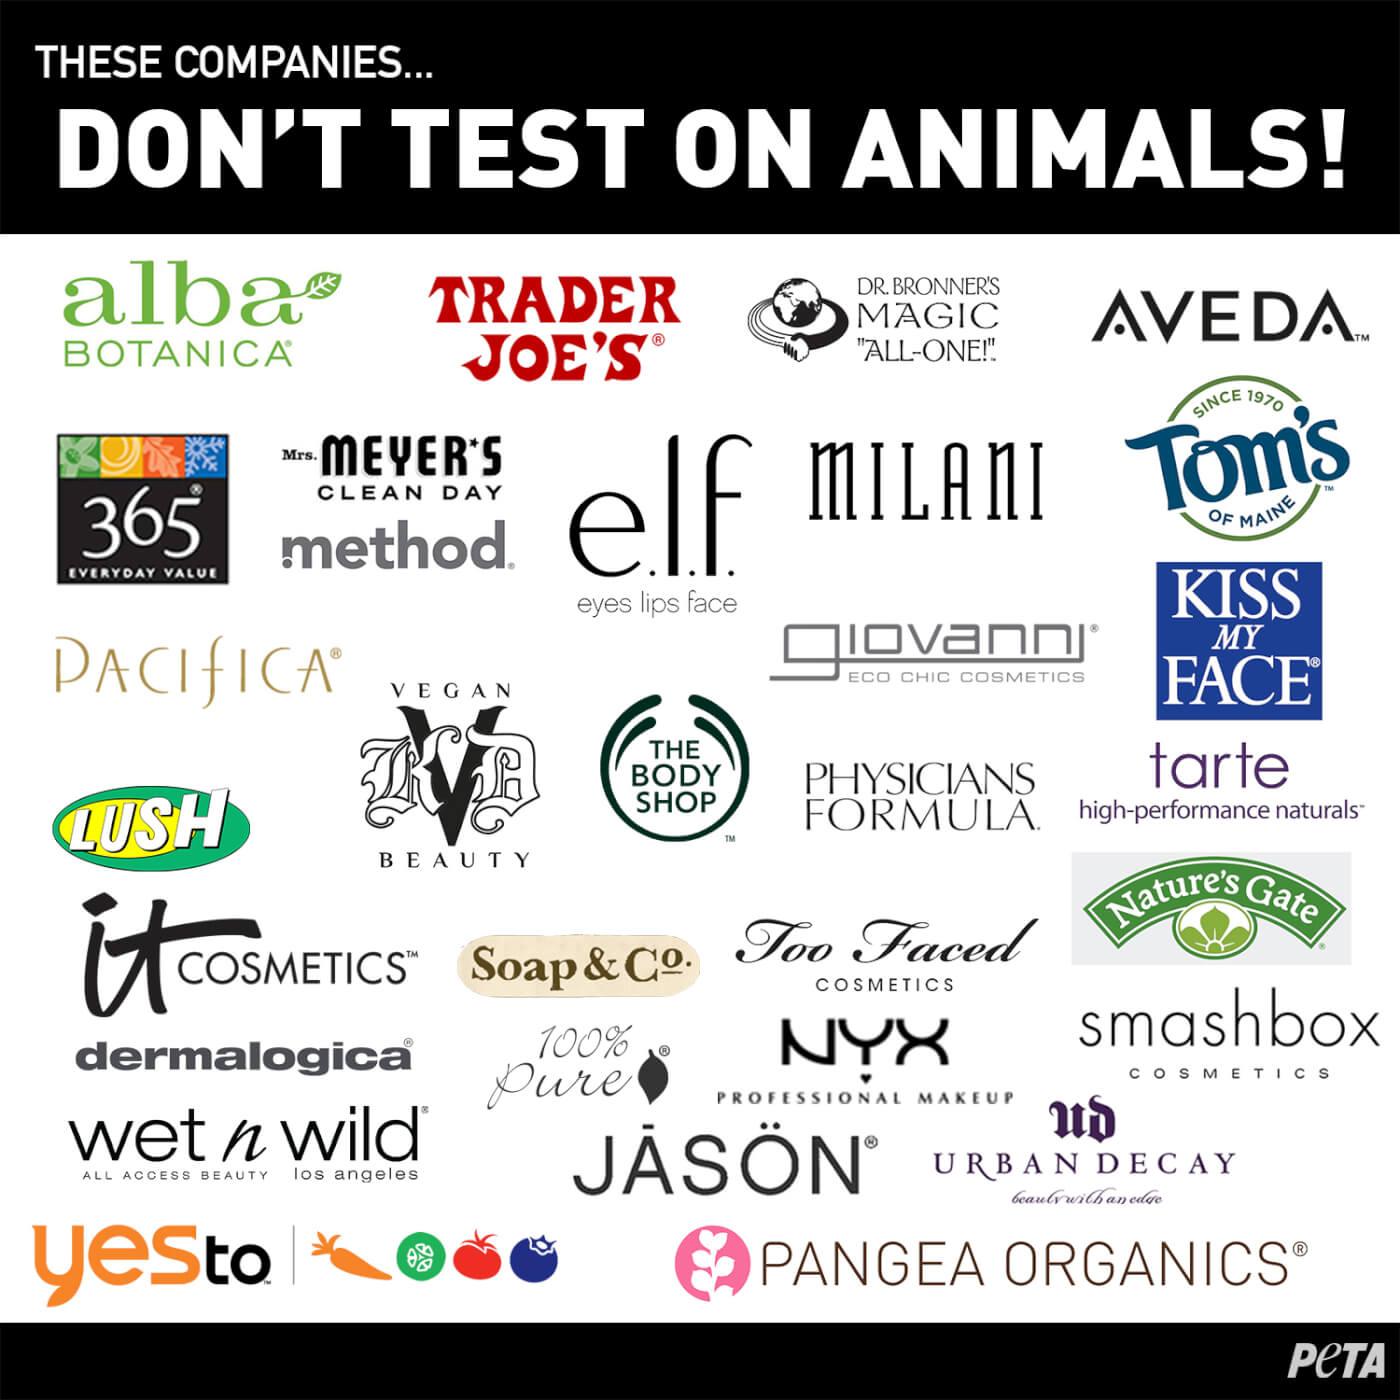 Vegan Makeup Products From Cruelty Free Brands   PETA